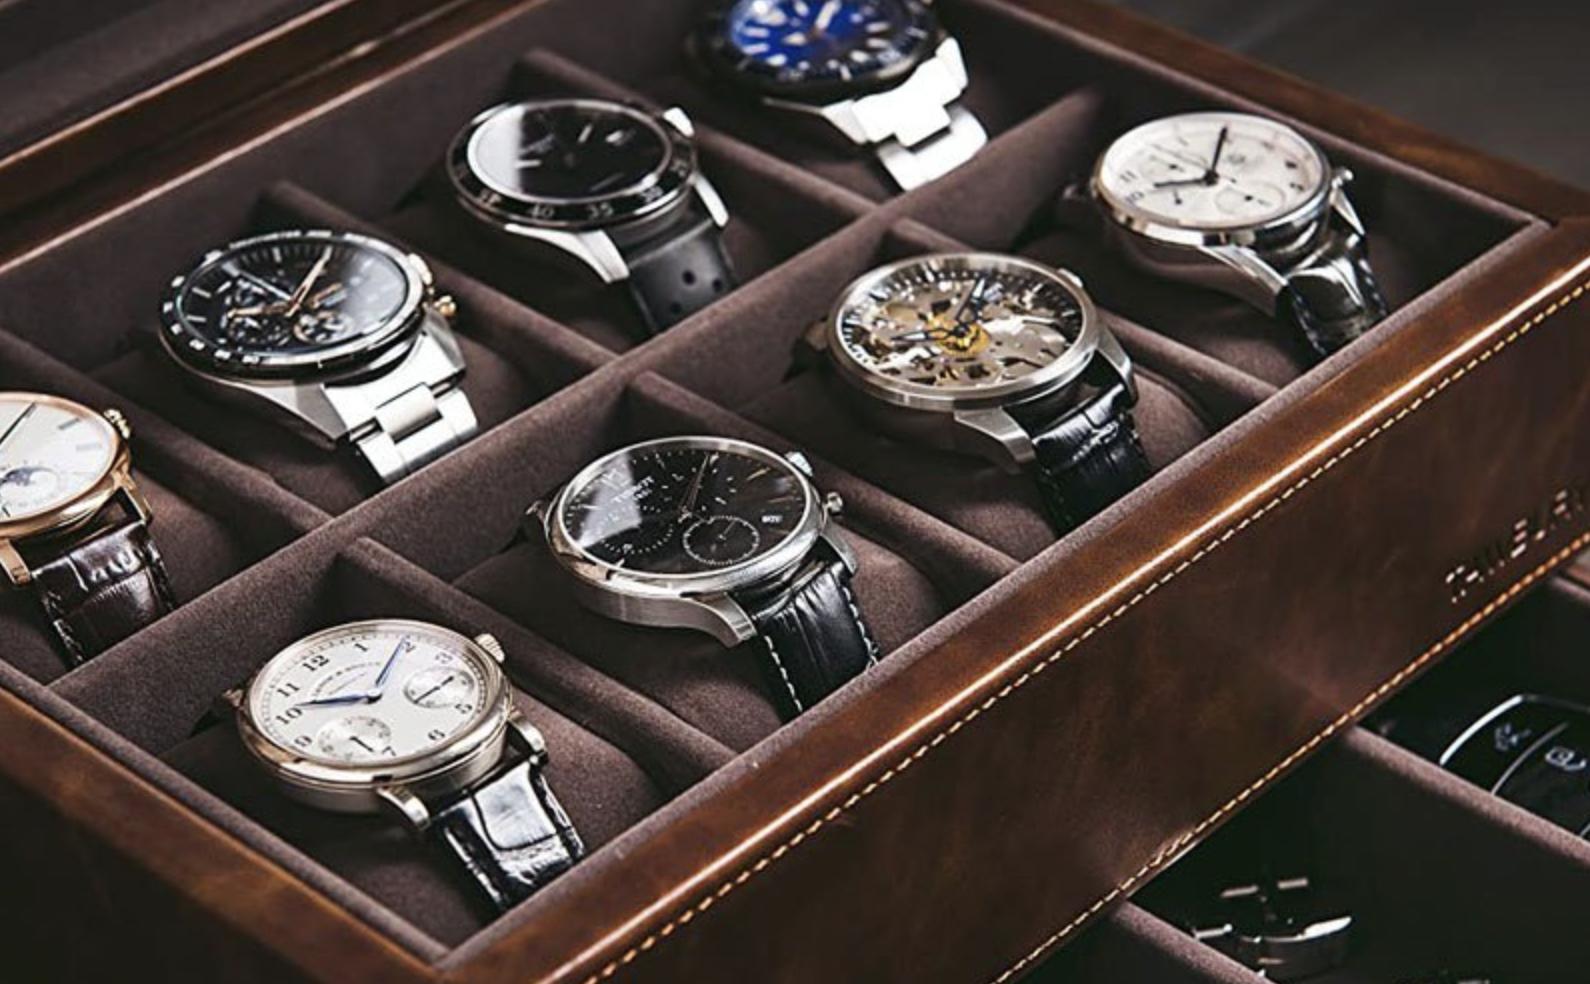 Top 5 Luxury Timepiece Brands